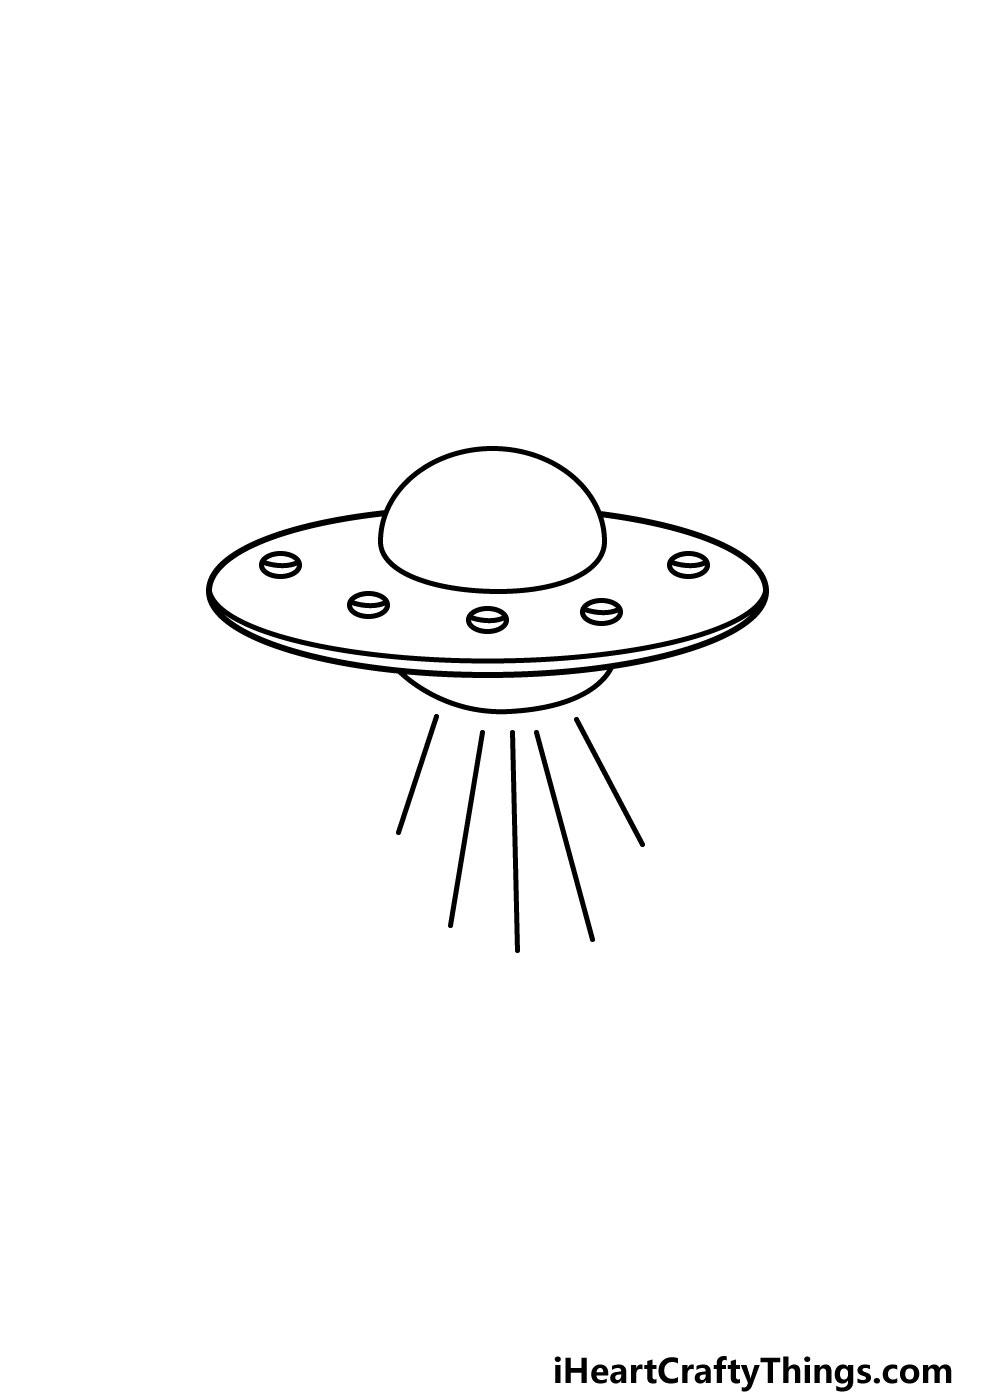 drawing a UFO step 5